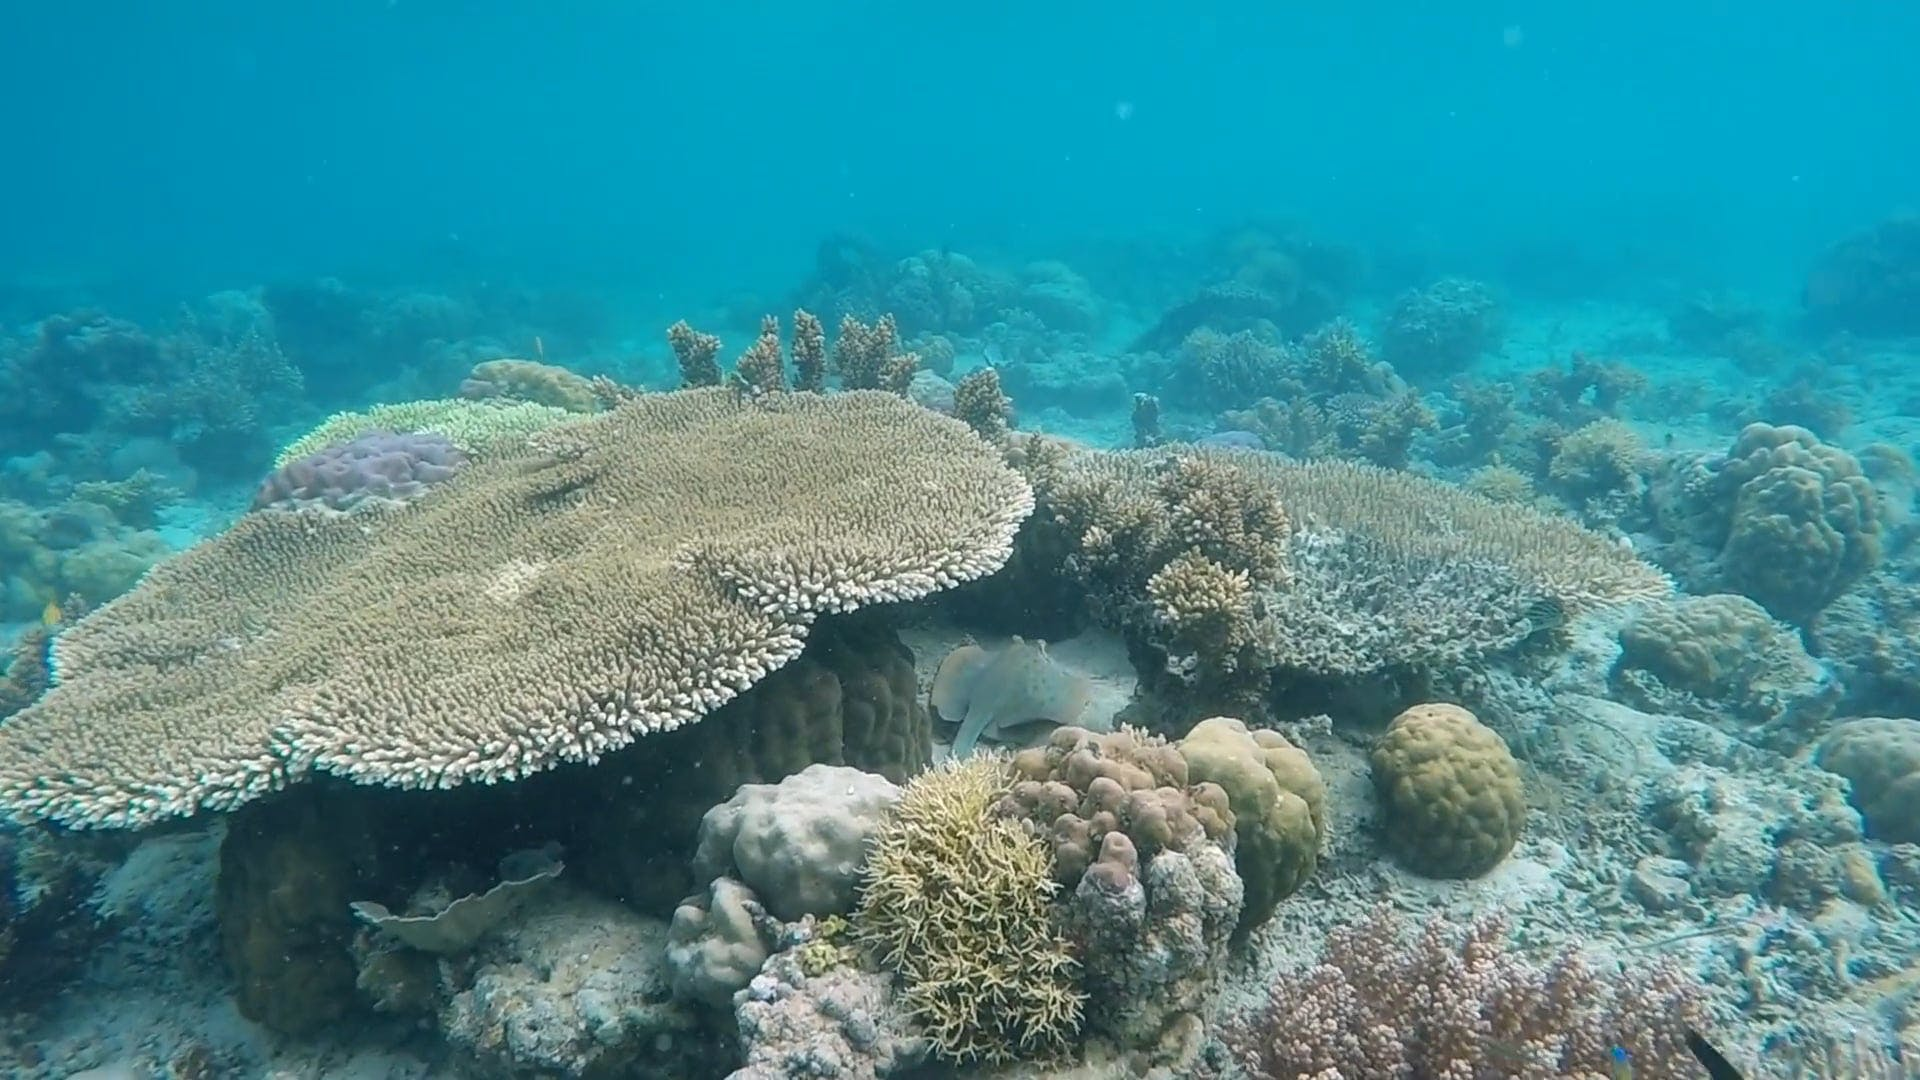 Creatures Underwater